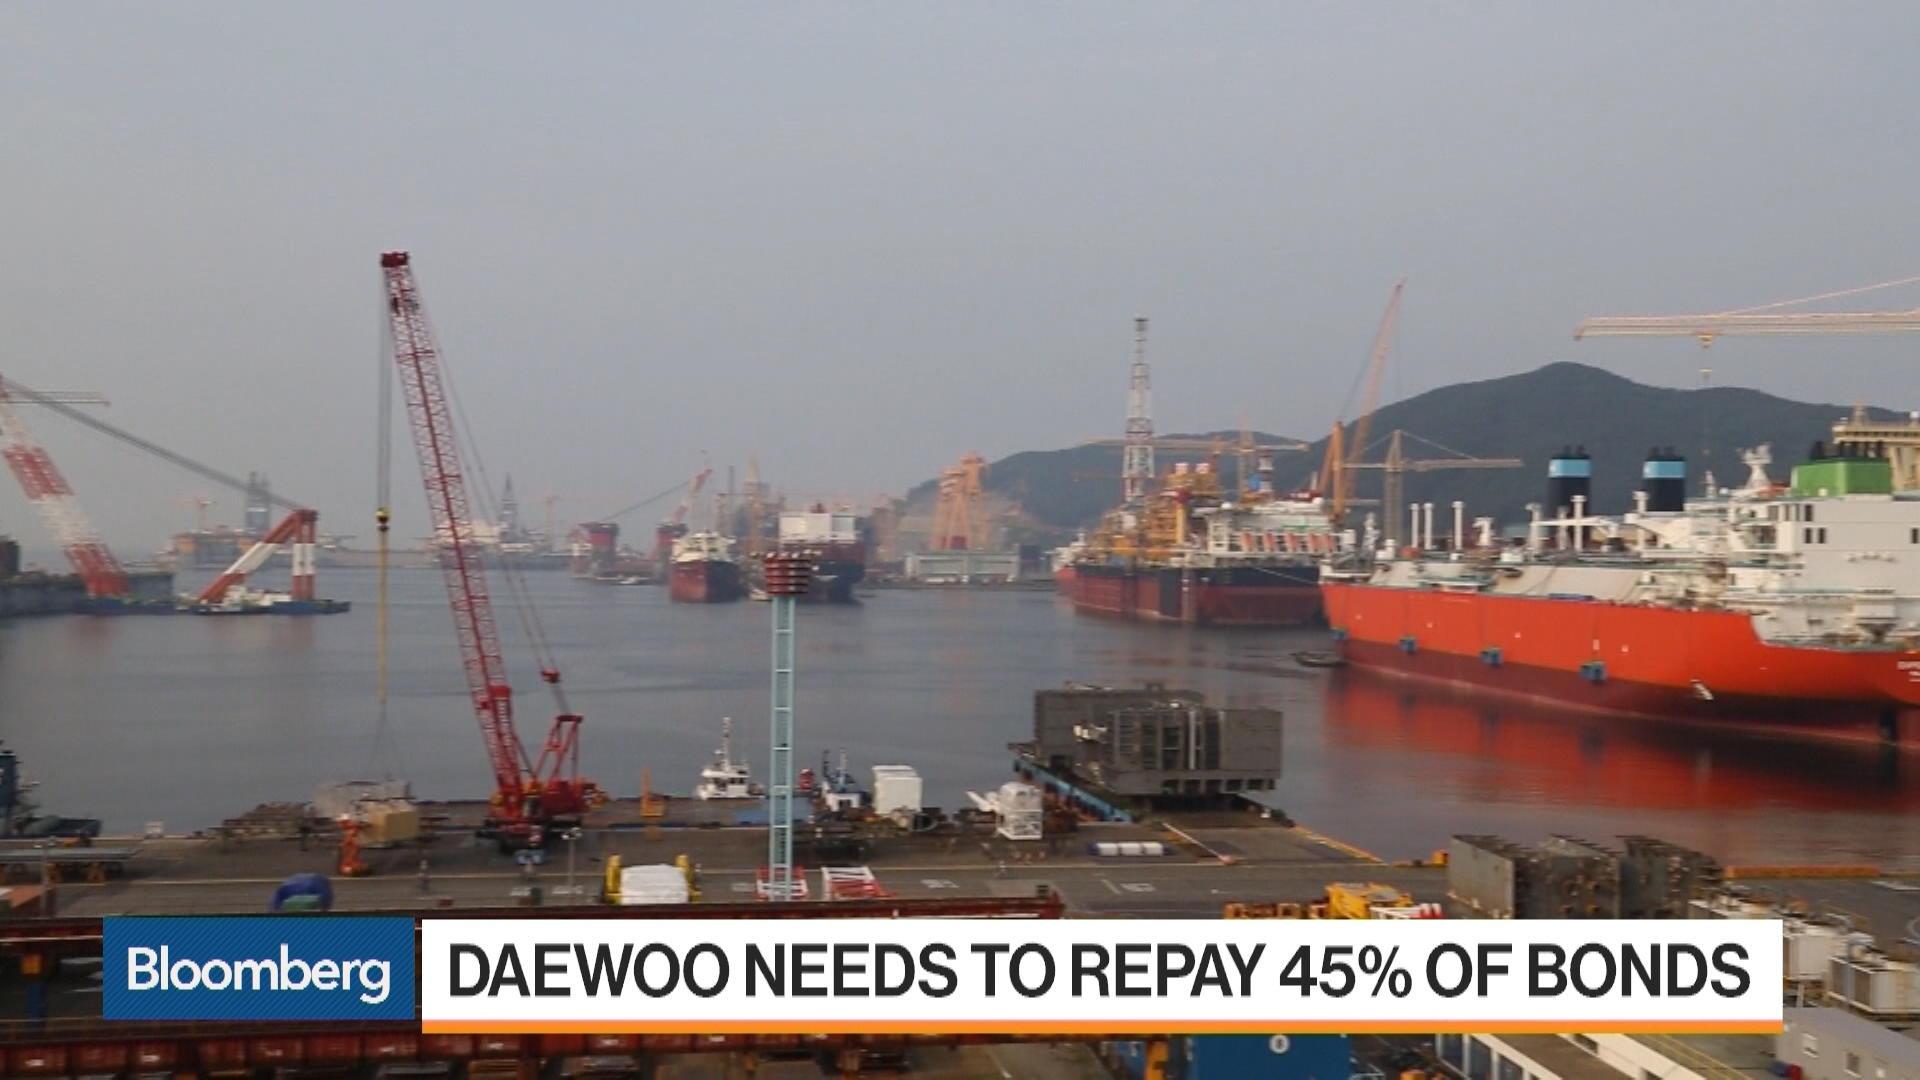 042660:Korea SE Stock Quote - Daewoo Shipbuilding & Marine